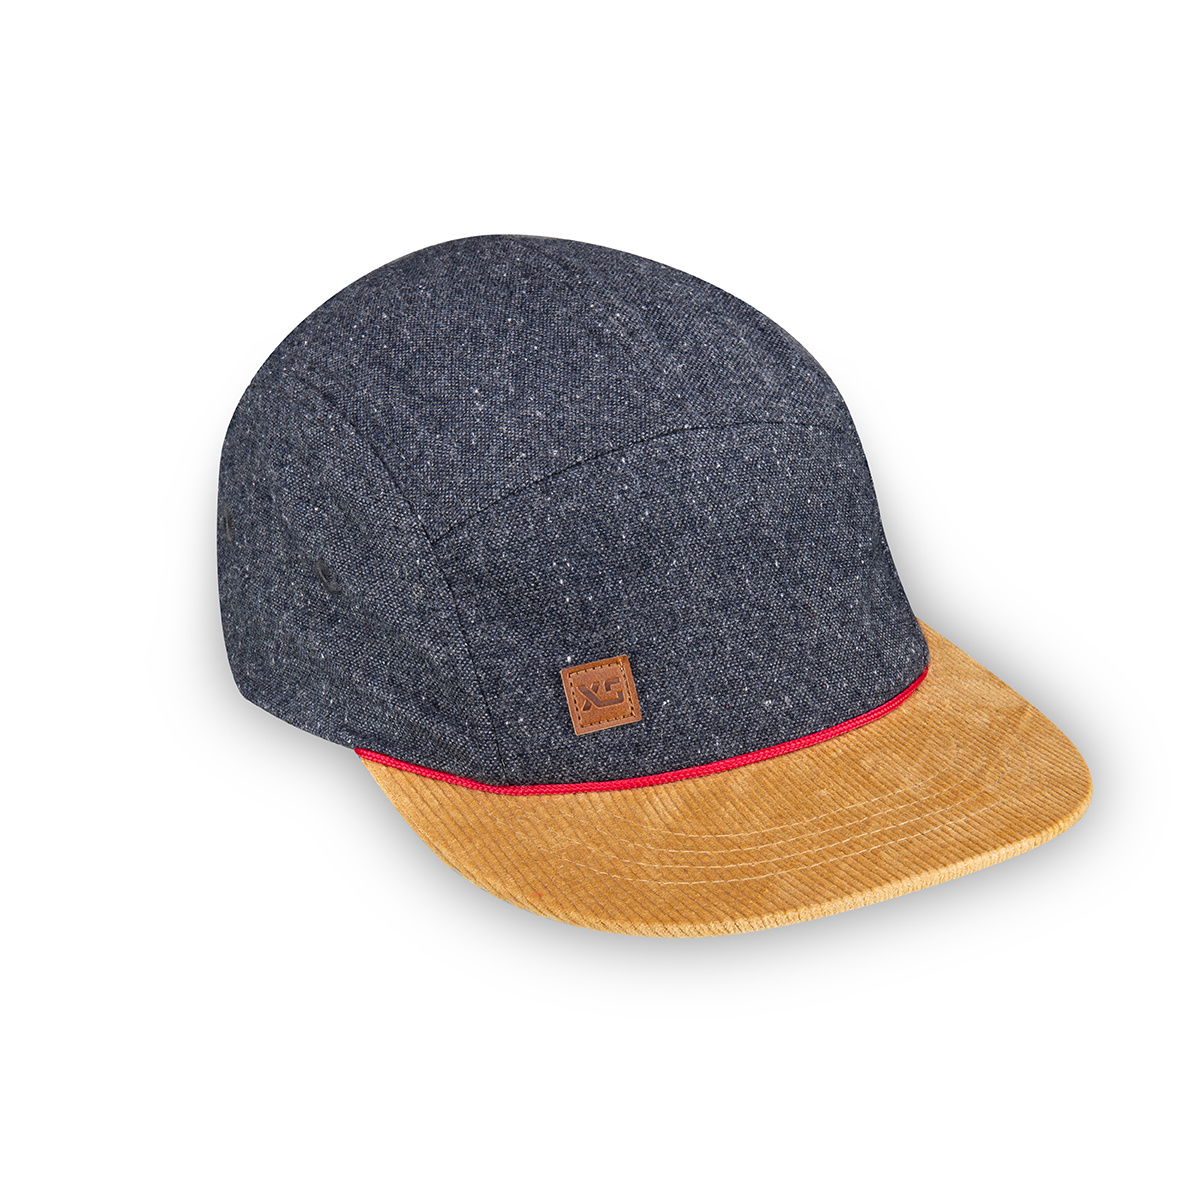 XS Unified XS Unified Kid's 5 Panel Hat Grey Wool